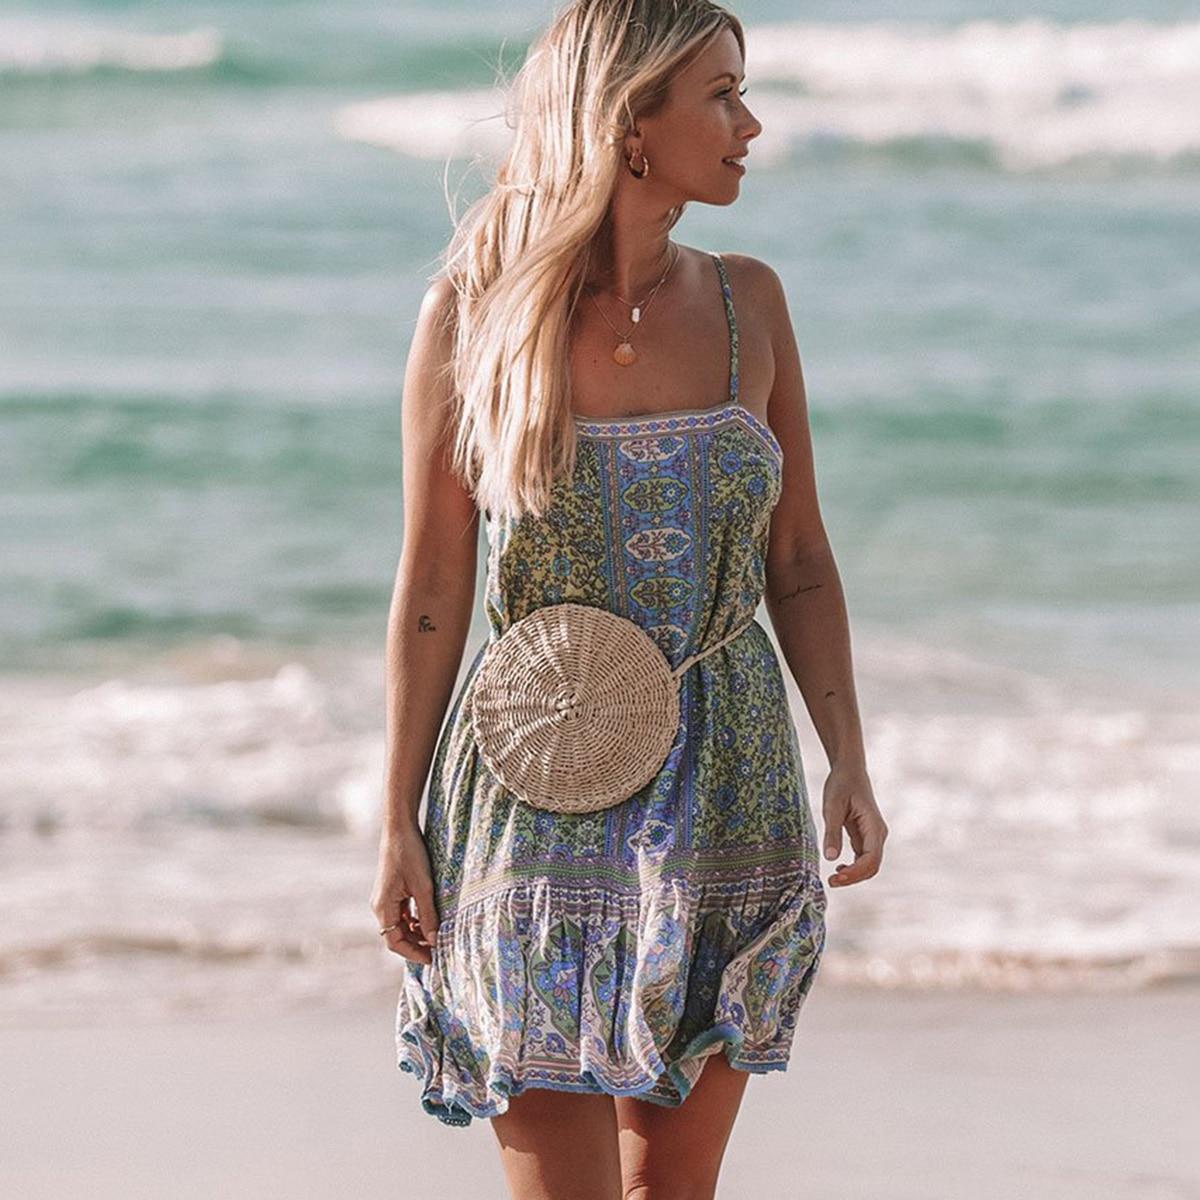 Bohemian Beach Dress Sexy Low Back Strappy Mini Dresses Vintage Floral Print Women Dress 2019 Summer Dresses Short Vestidos